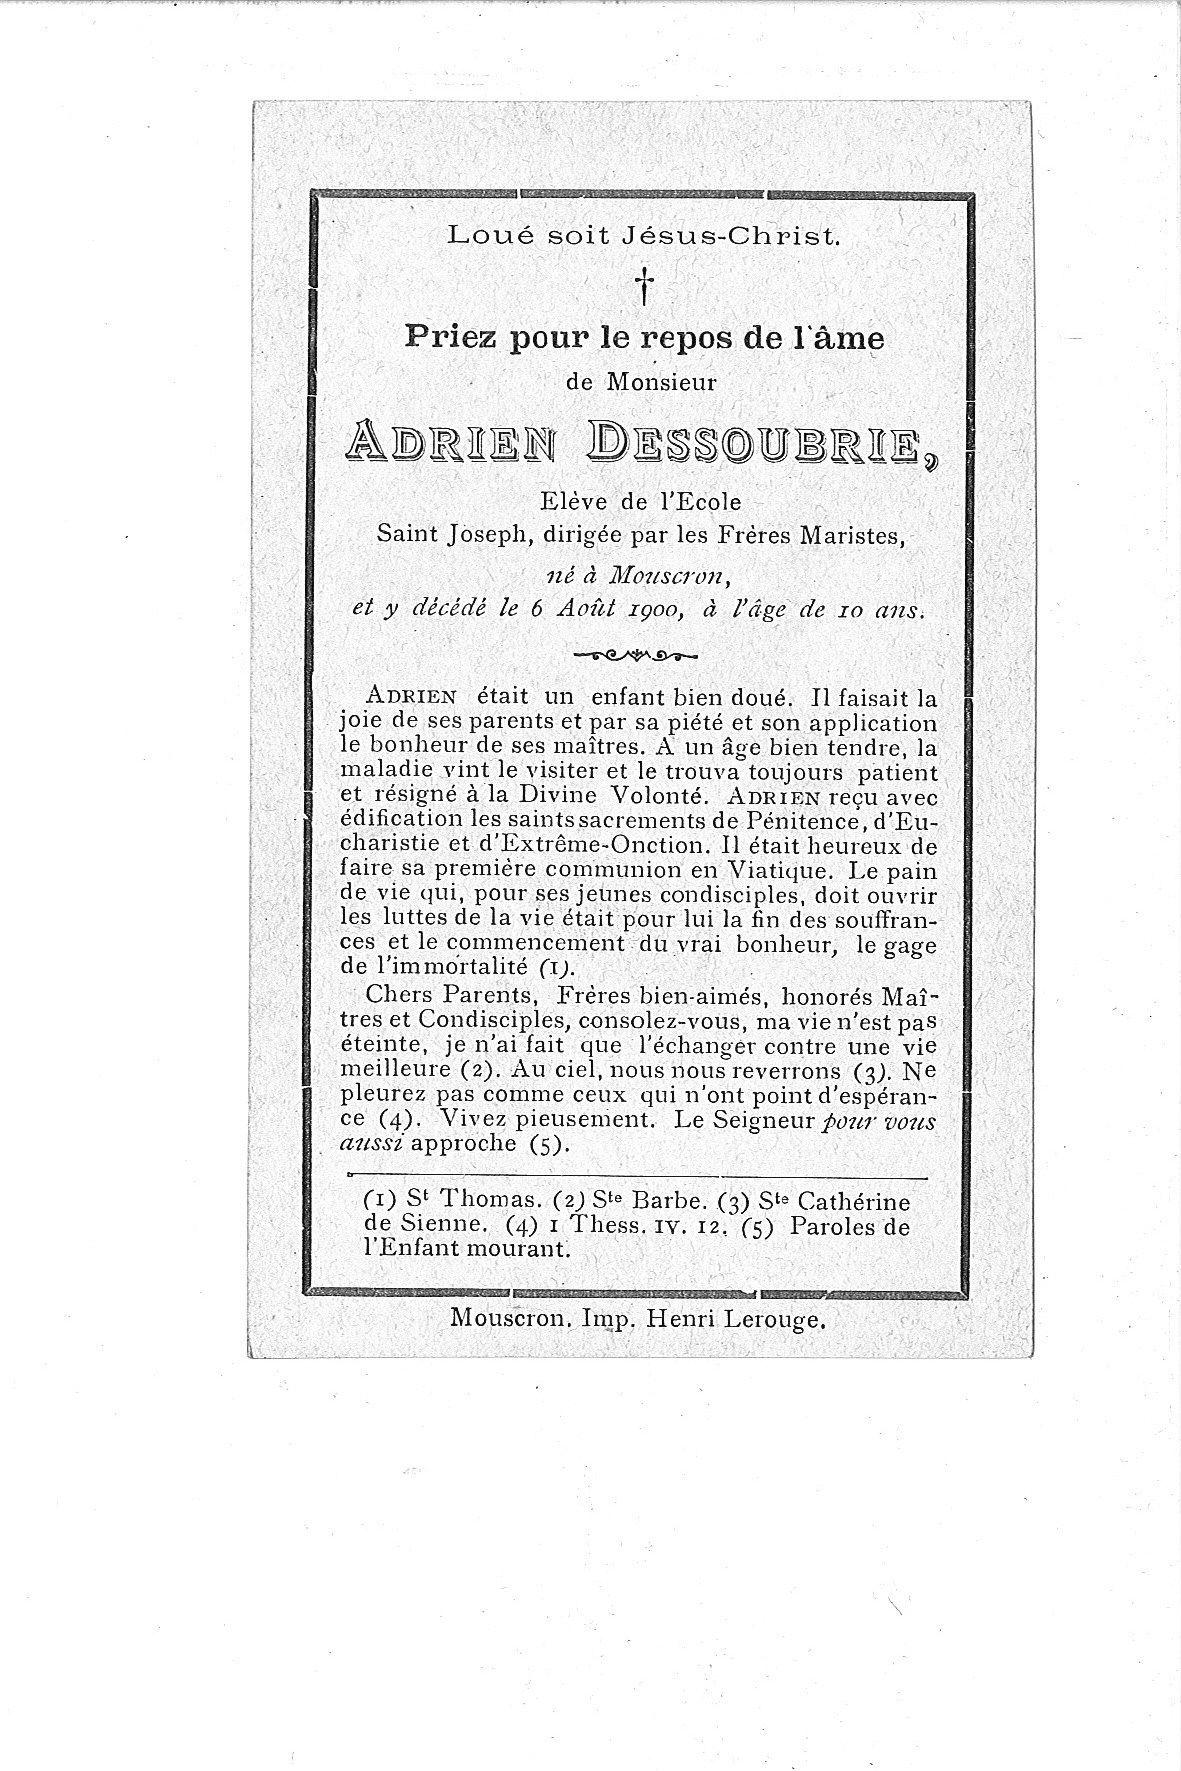 Adrien(1900)20091019165634_00045.jpg